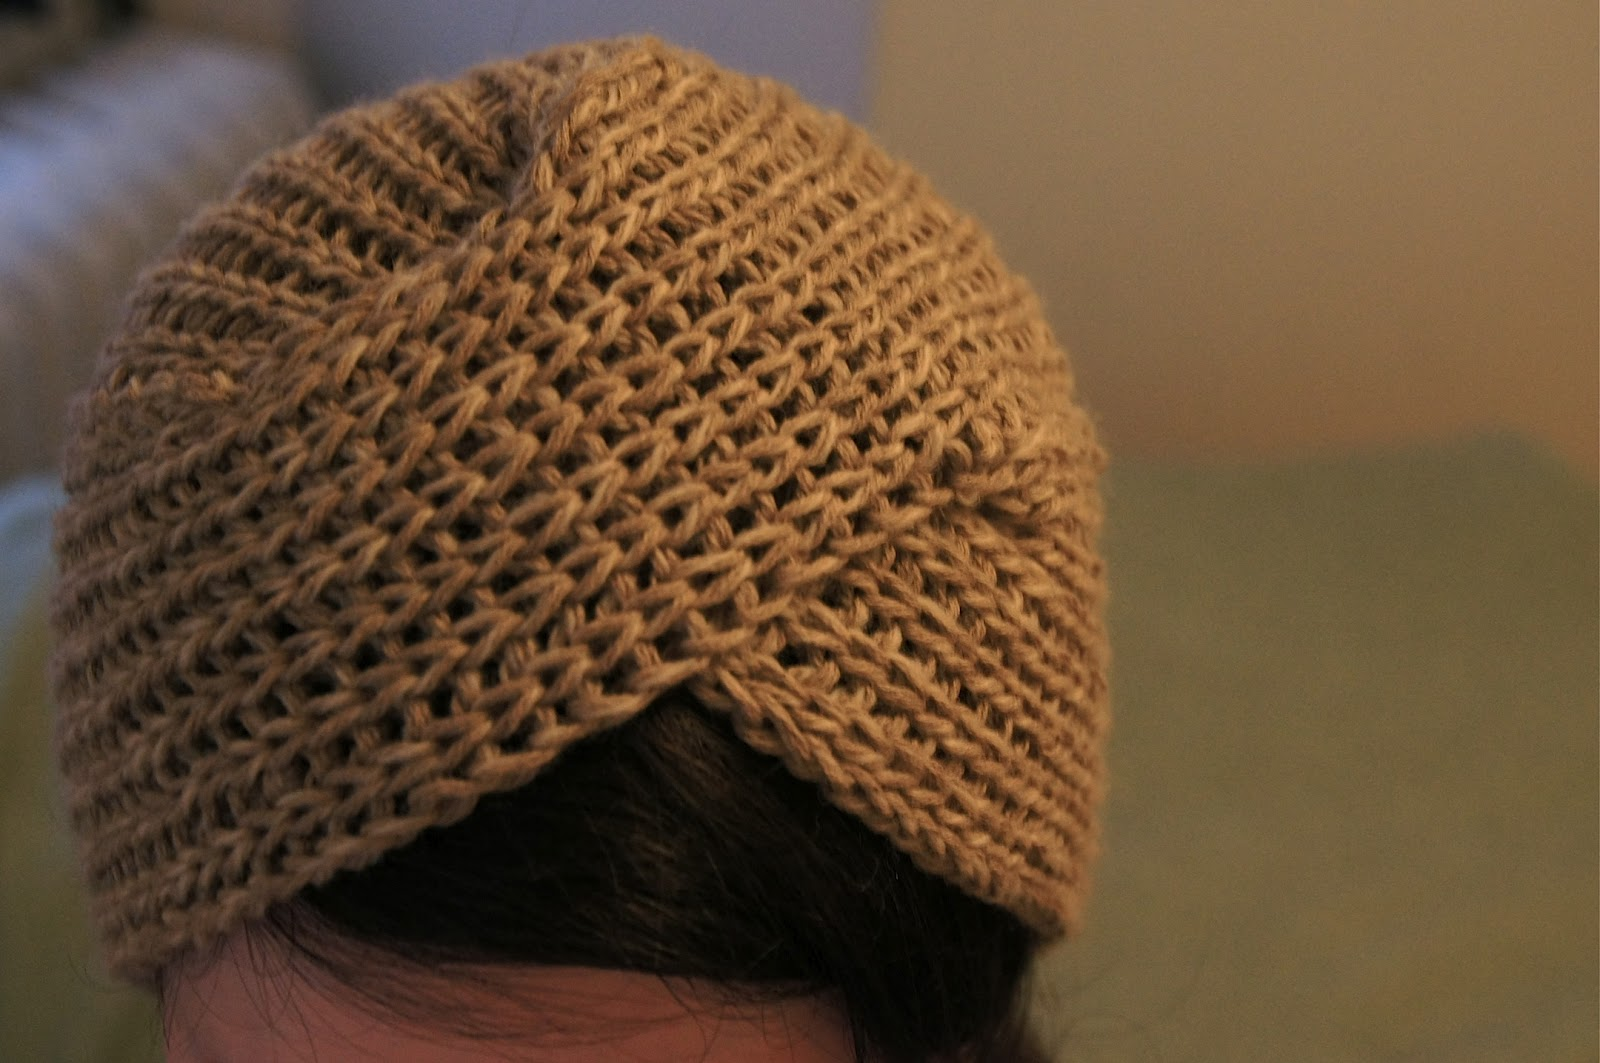 Wool Knitting Tutorial : Rerae knit turban tutorial